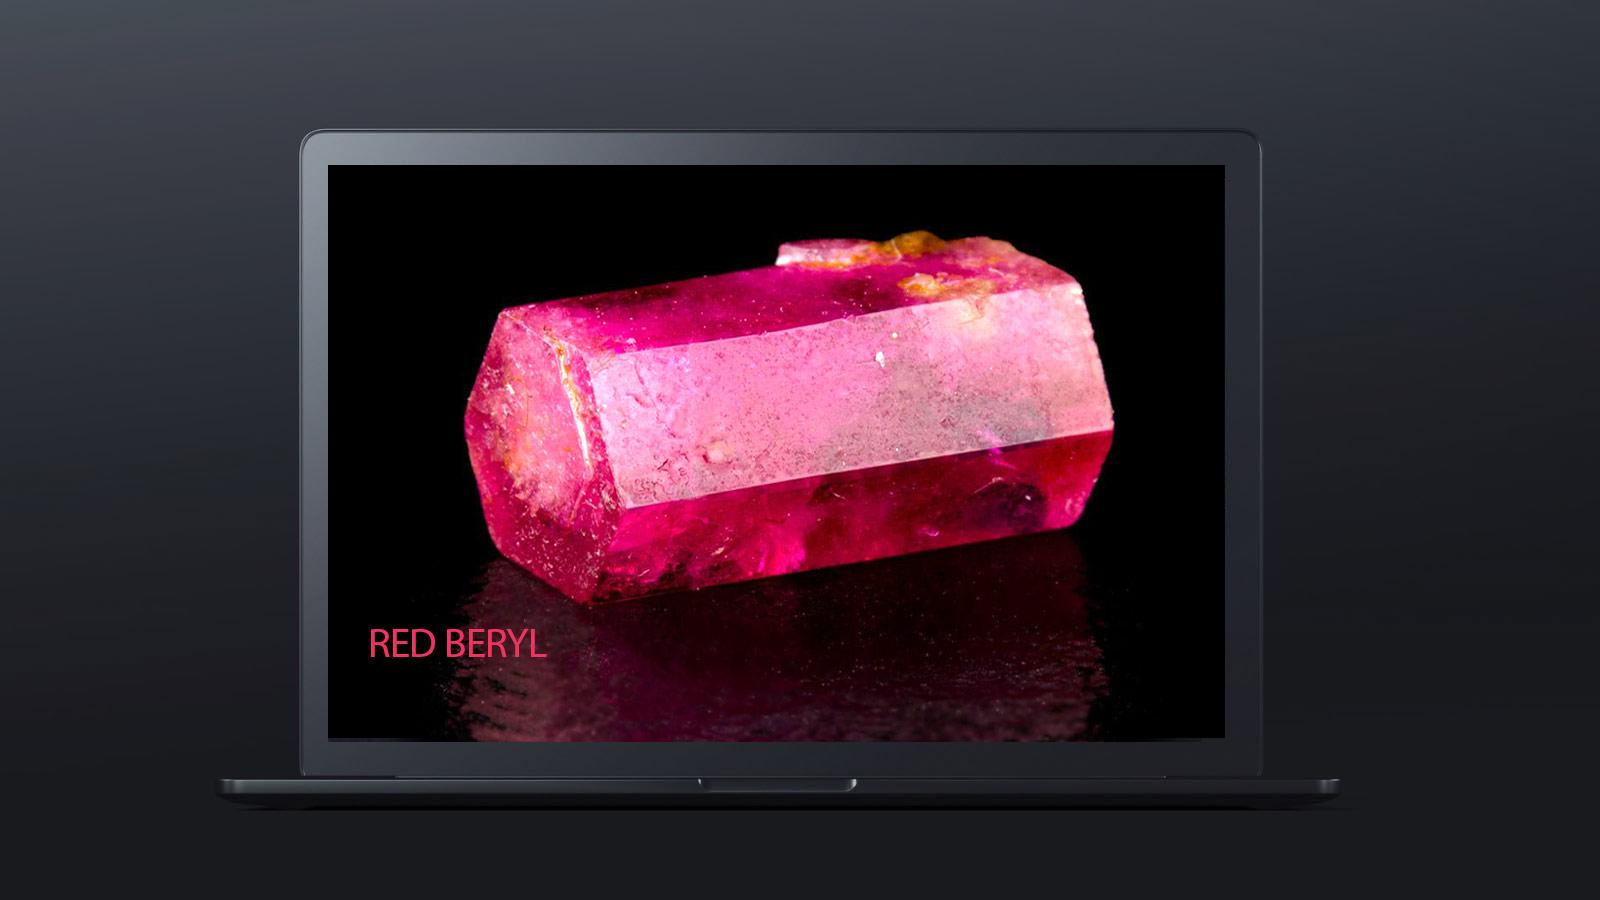 10 worlds rarest gemstones RED BERYL 1 - ده گوهر کمیاب دنیا کدامند؟